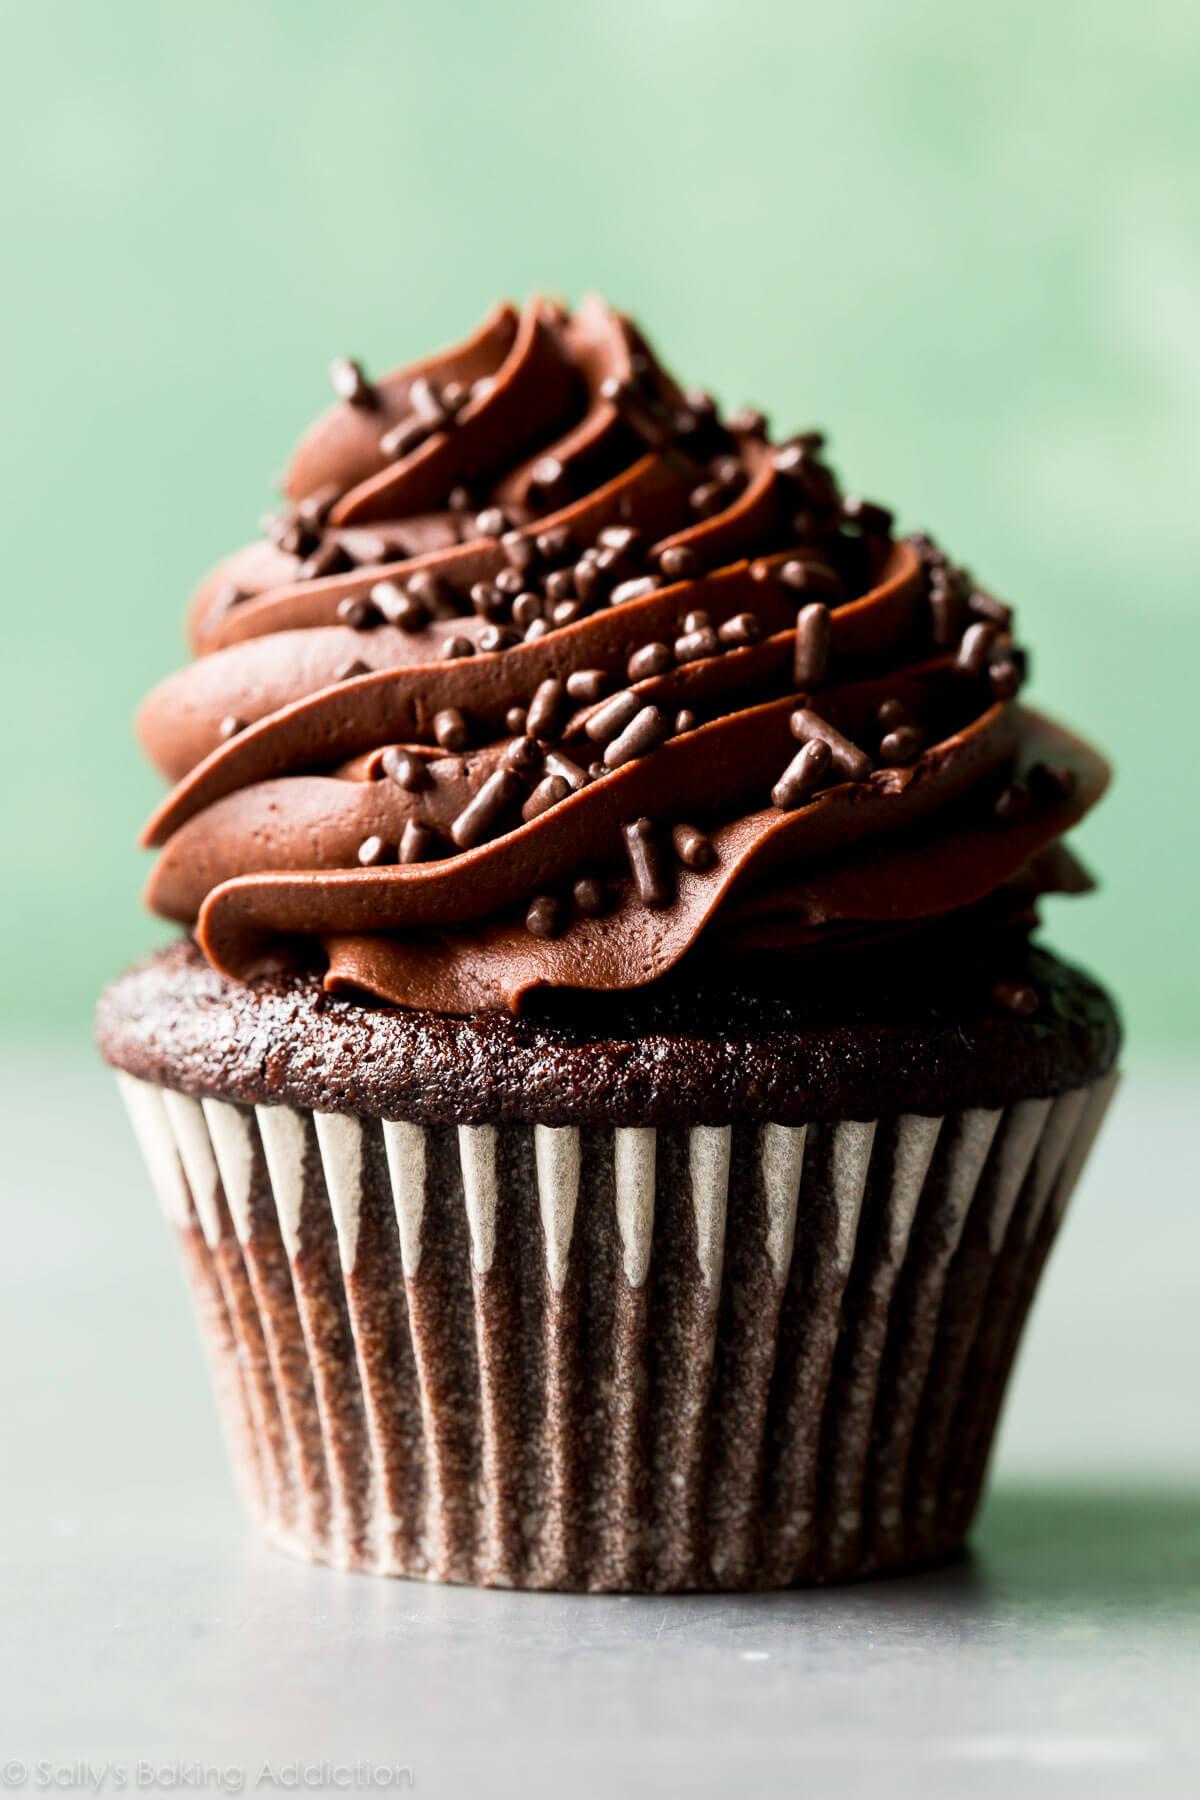 Chocolate Cupcakes Recipe  Classic Chocolate Cupcakes with Vanilla Frosting Sallys